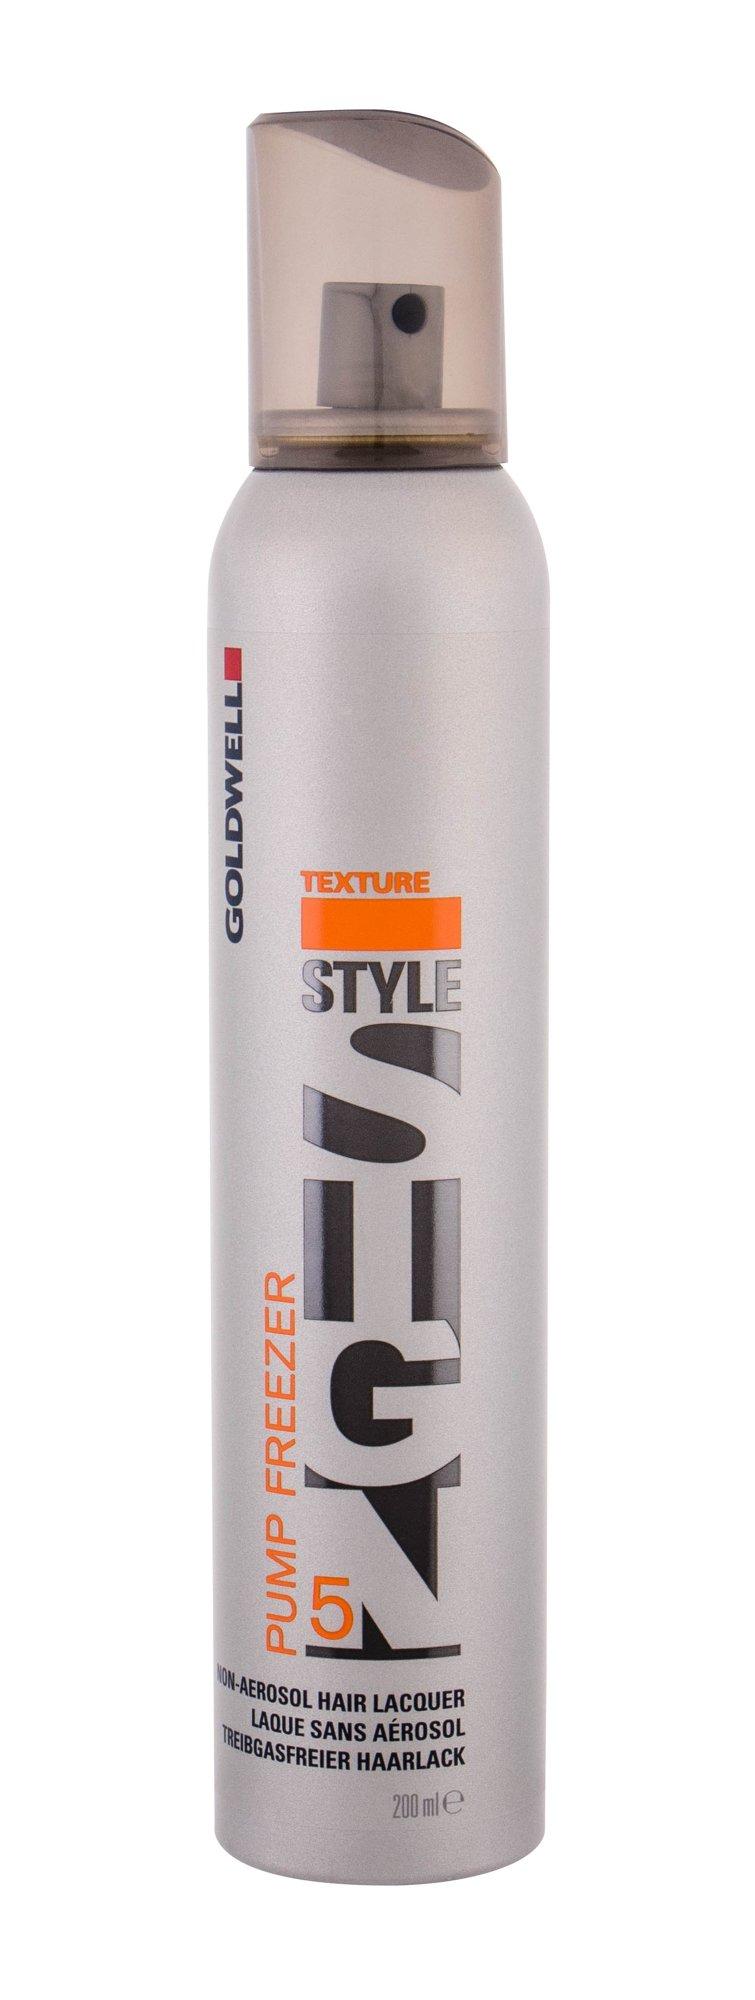 Goldwell Style Sign Texture Hair Spray 200ml  Pump Freezer